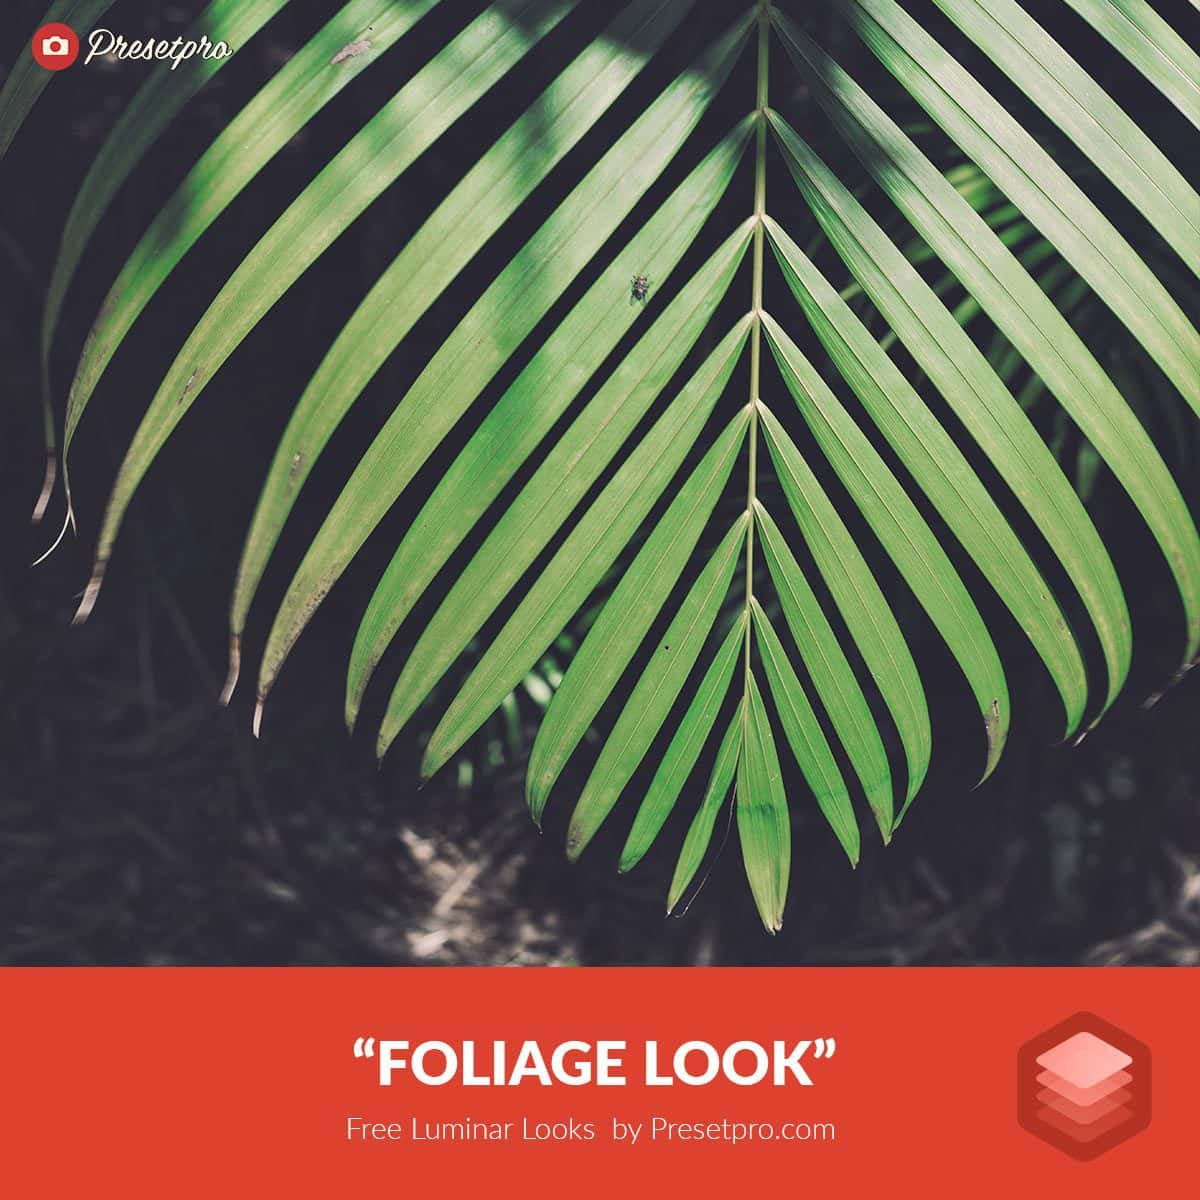 Free-Luminar-Look-Foliage-Preset-Presetpro.com